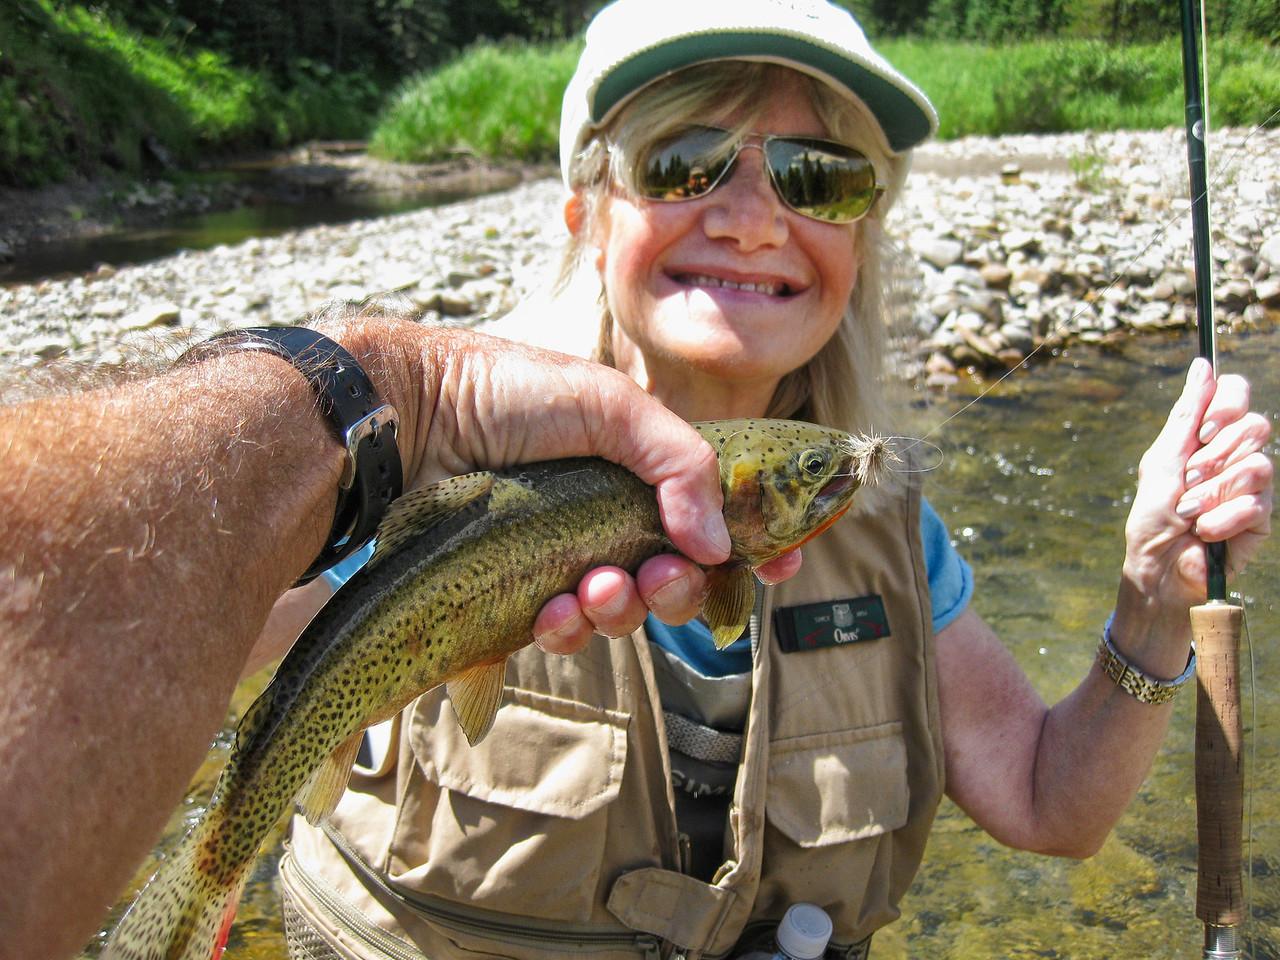 Carol's cutthroat trout